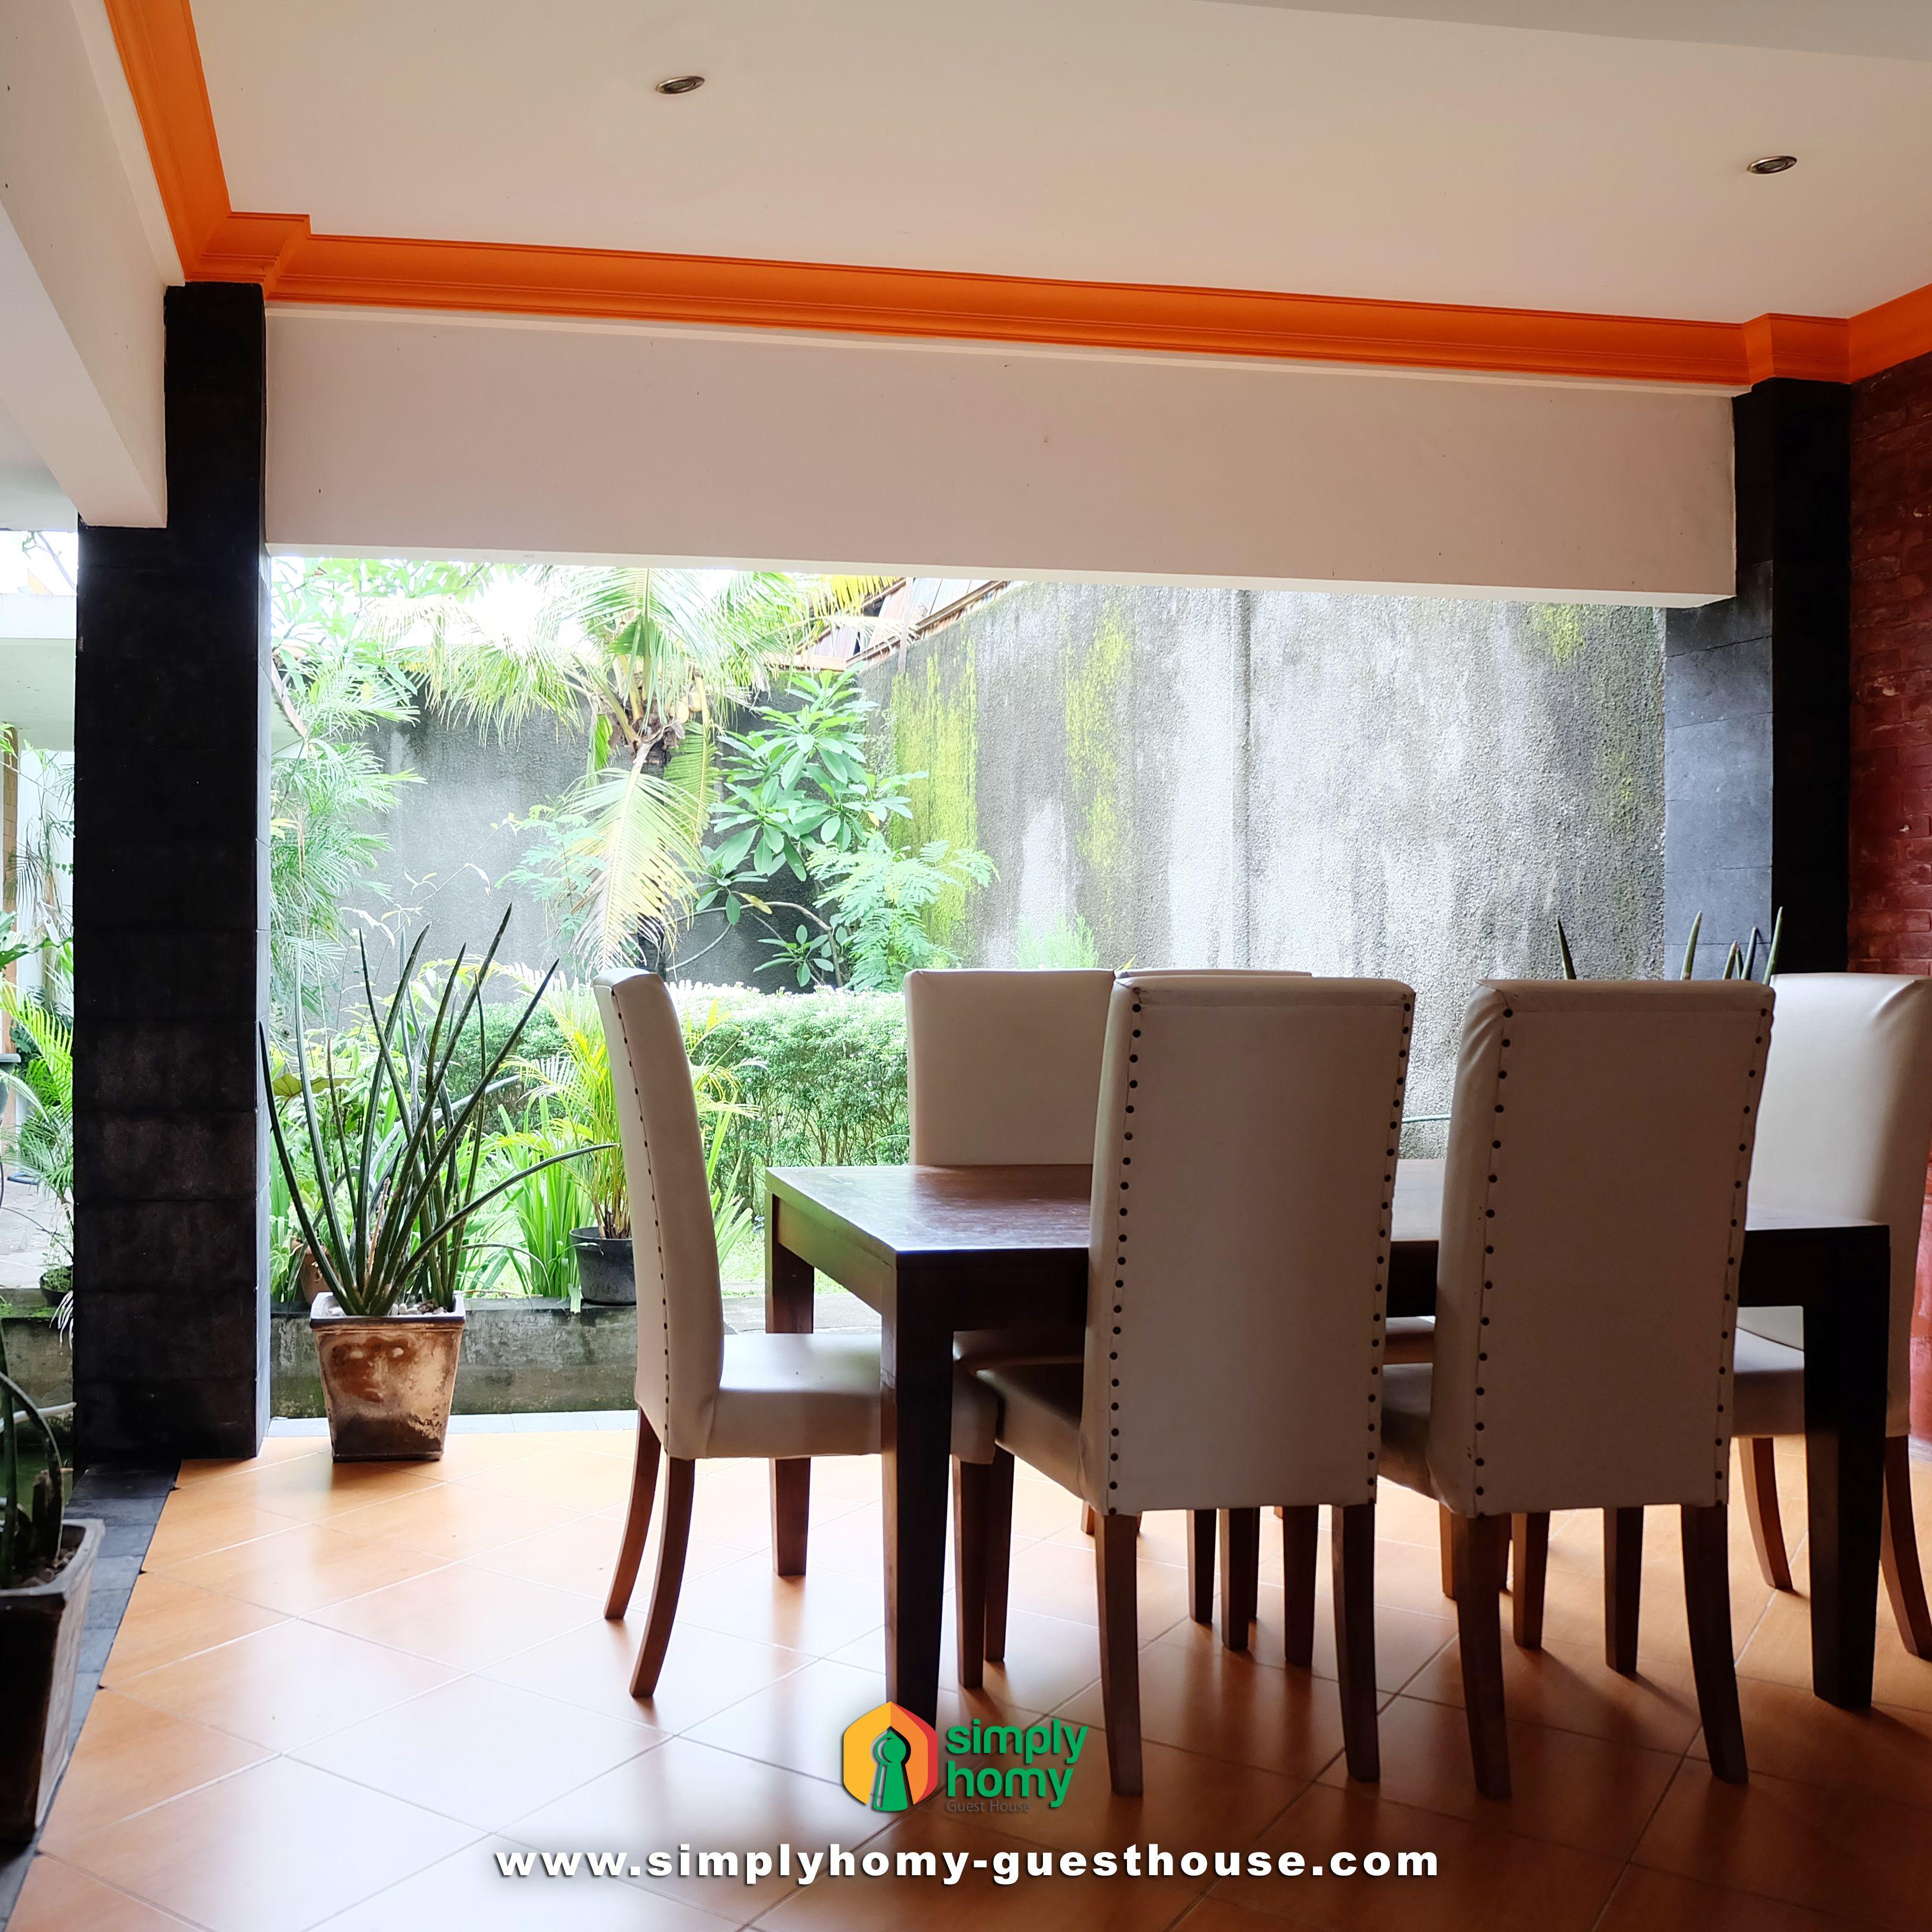 Simply Homy Guest House Wirosaban, Yogyakarta